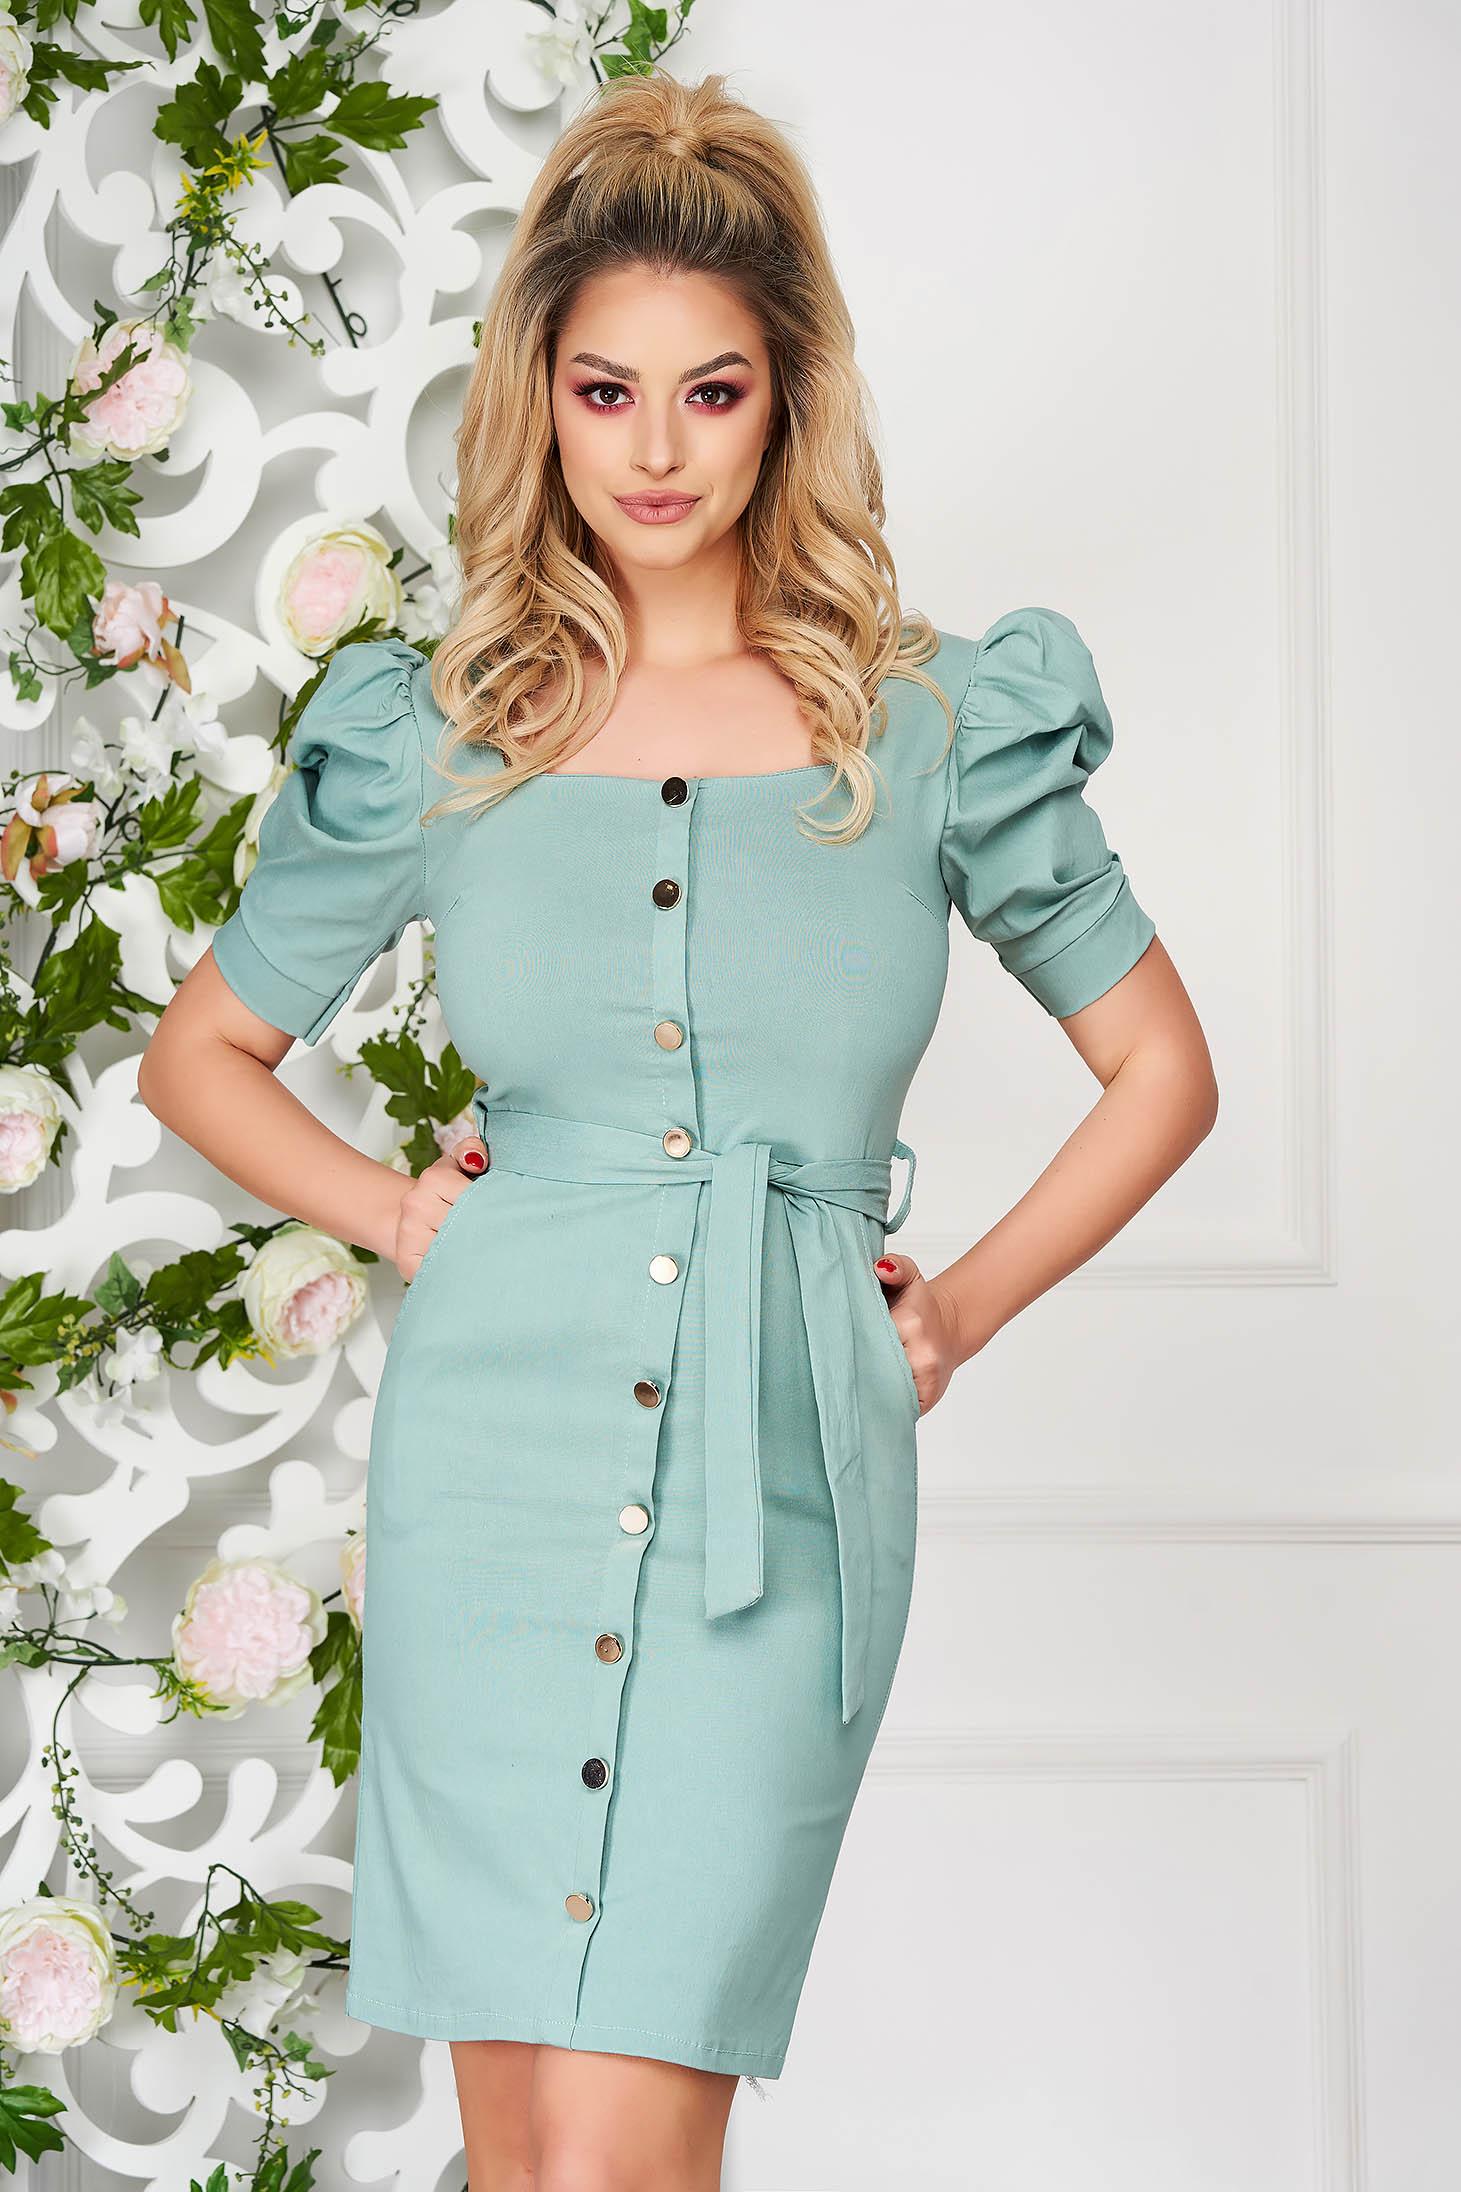 Turquoise dress elegant short cut pencil with pockets high shoulders